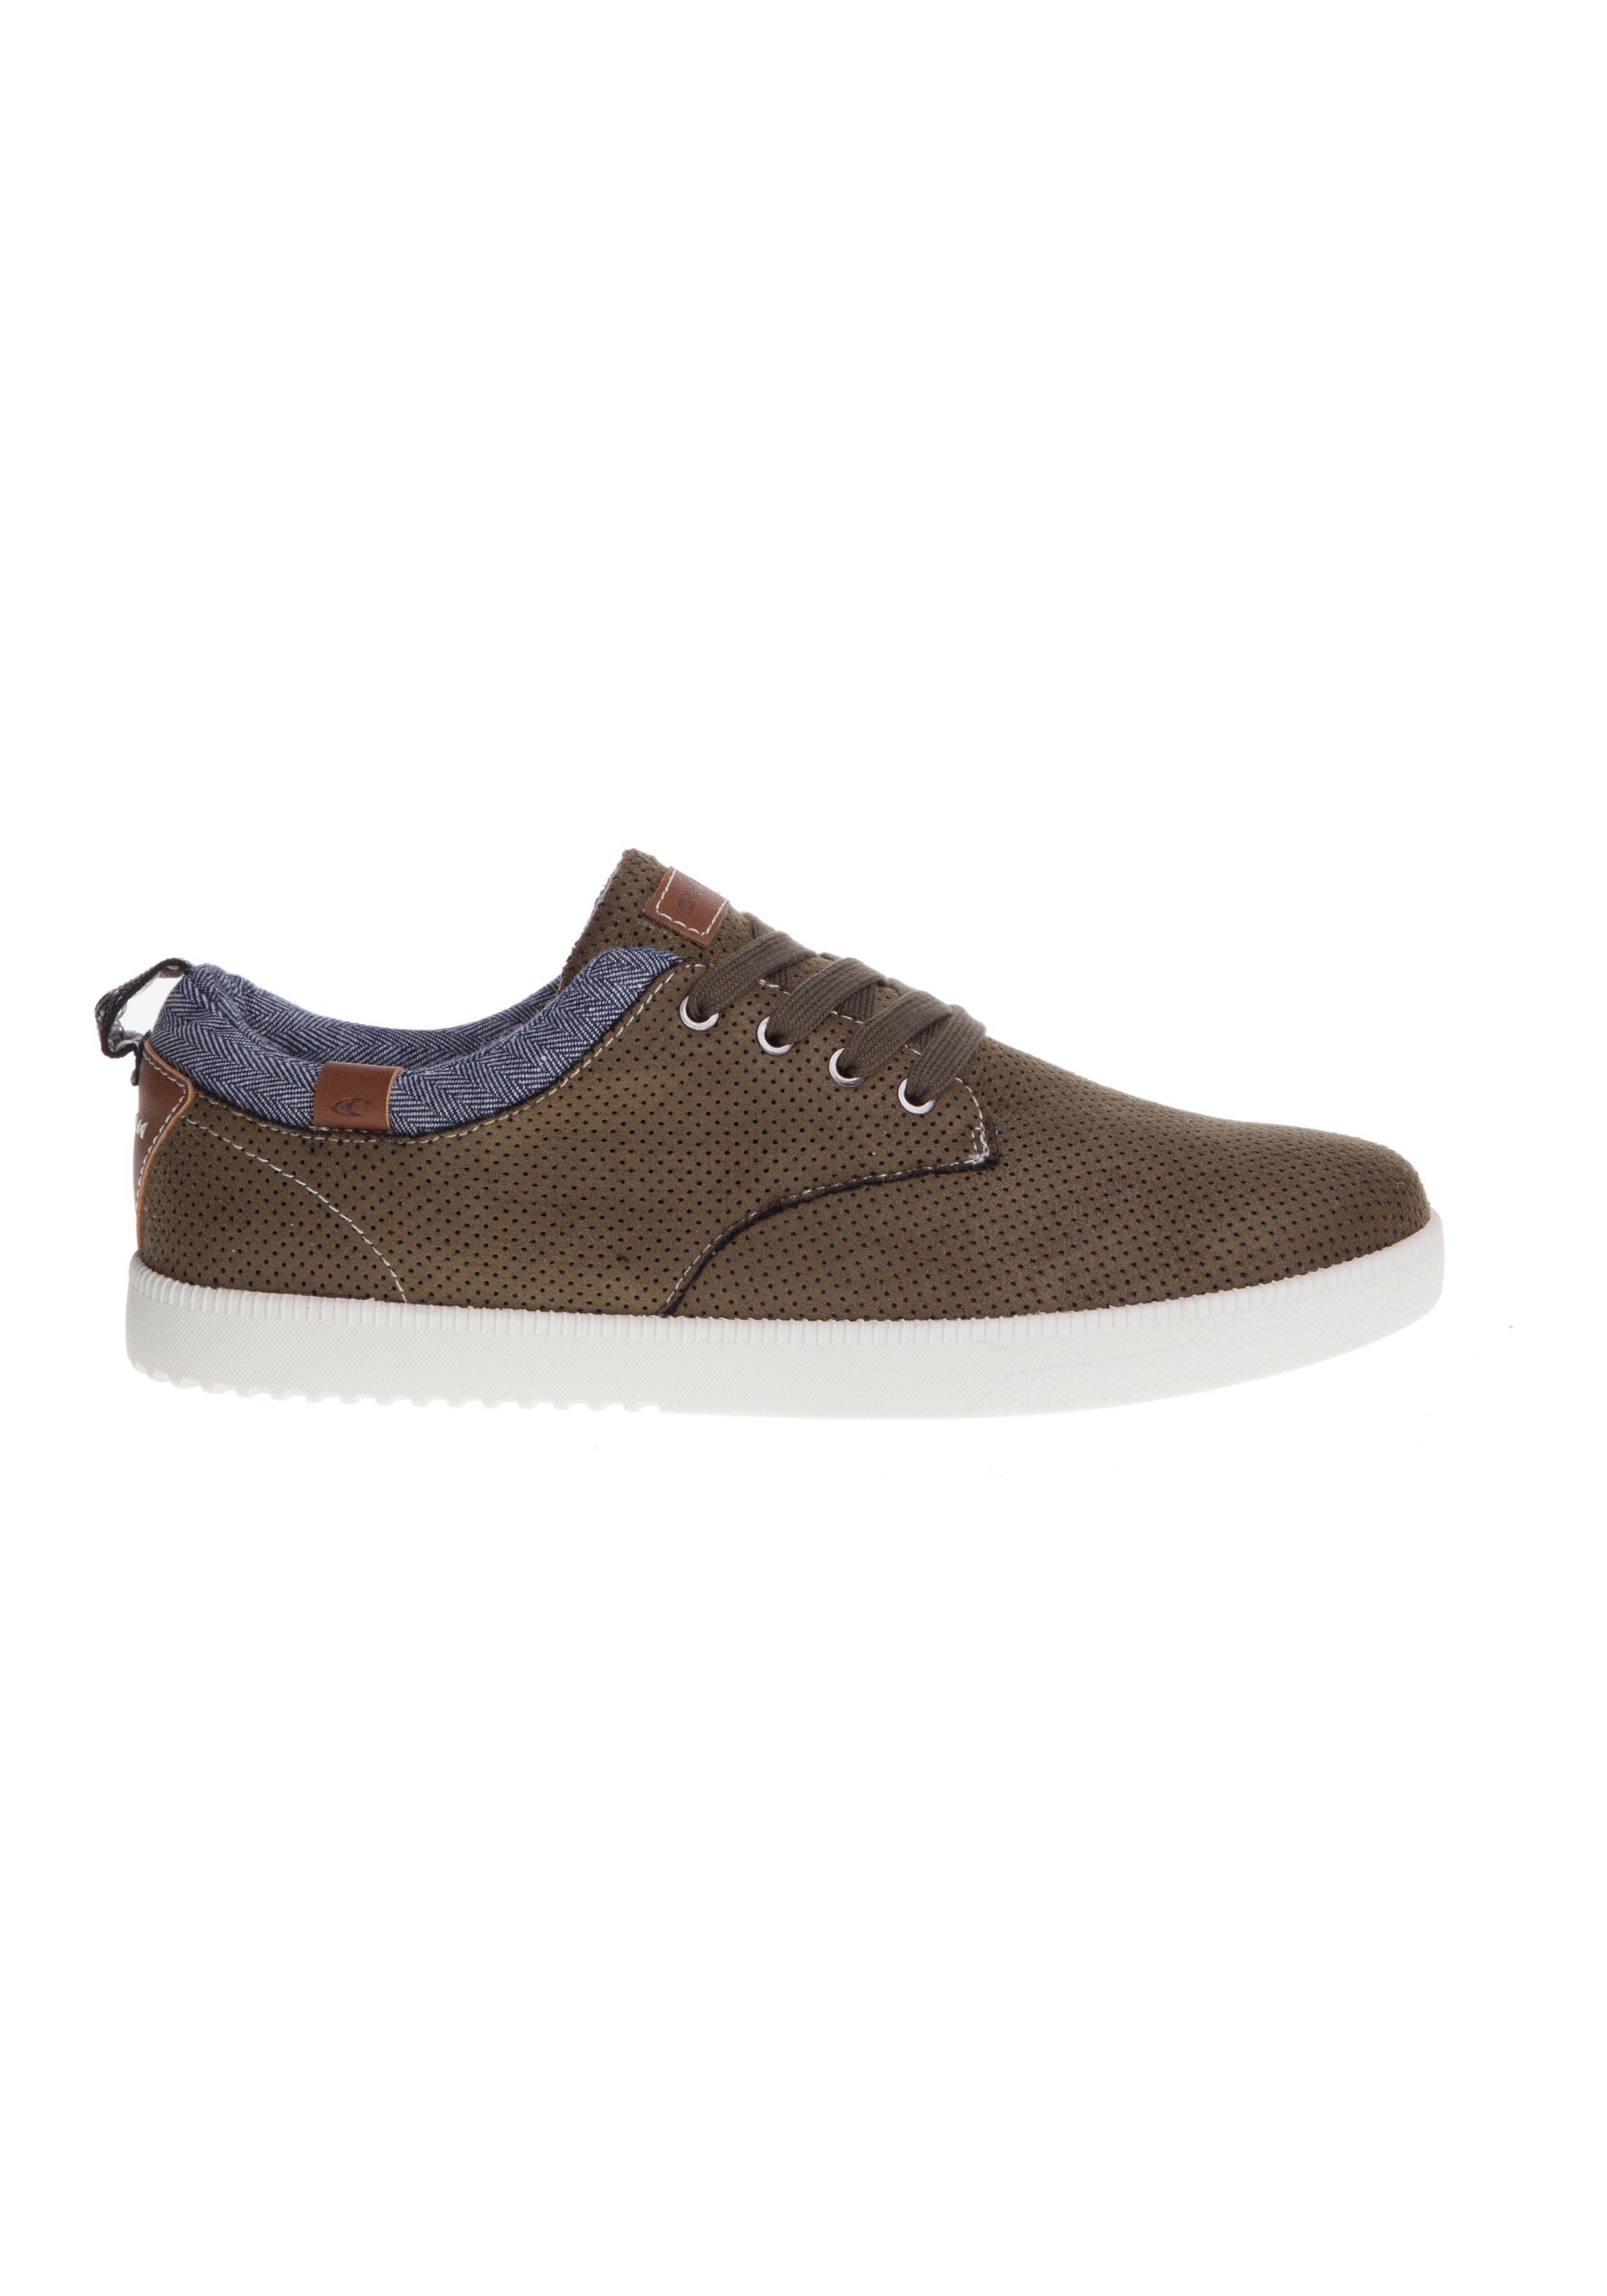 O'Neill Contourer synthetic Sneaker kaufen  khaki